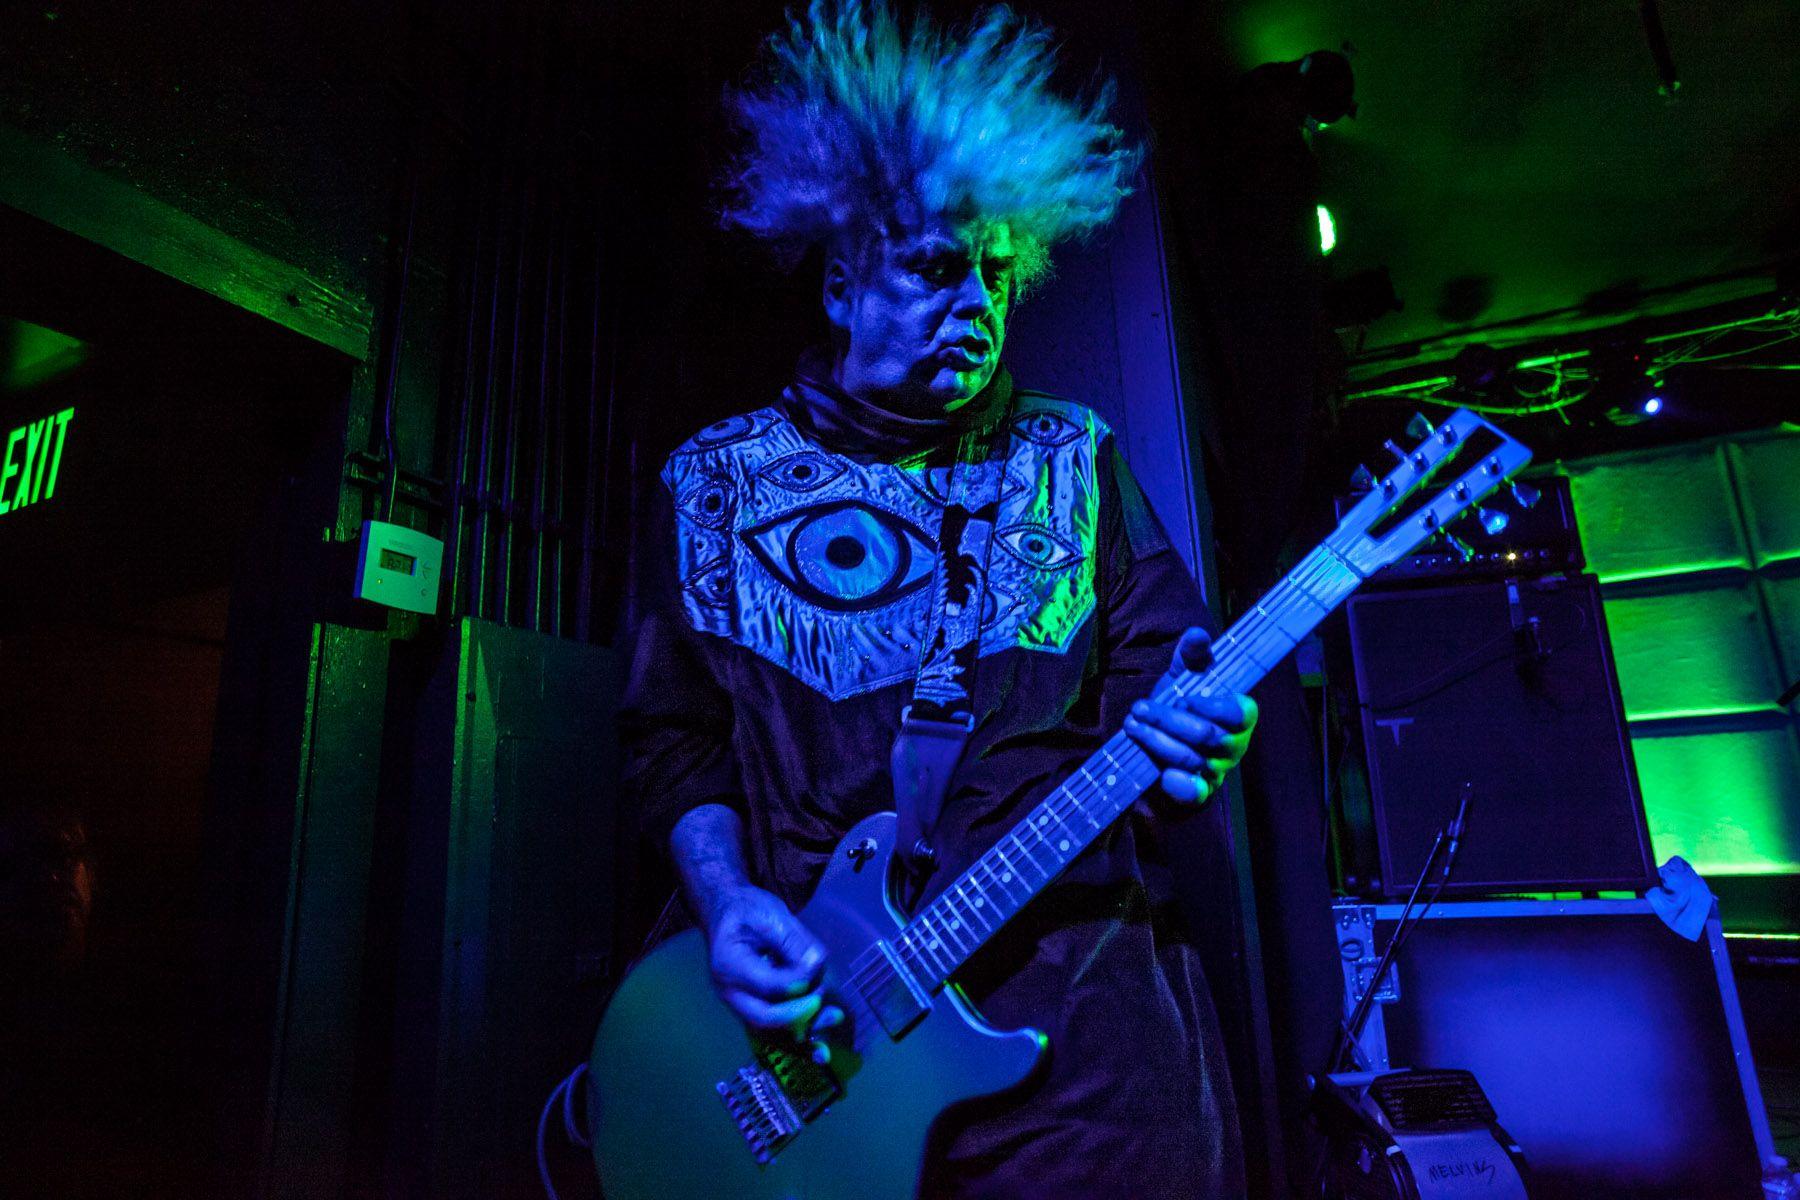 Melvins - 2015 - Los Angeles, CA